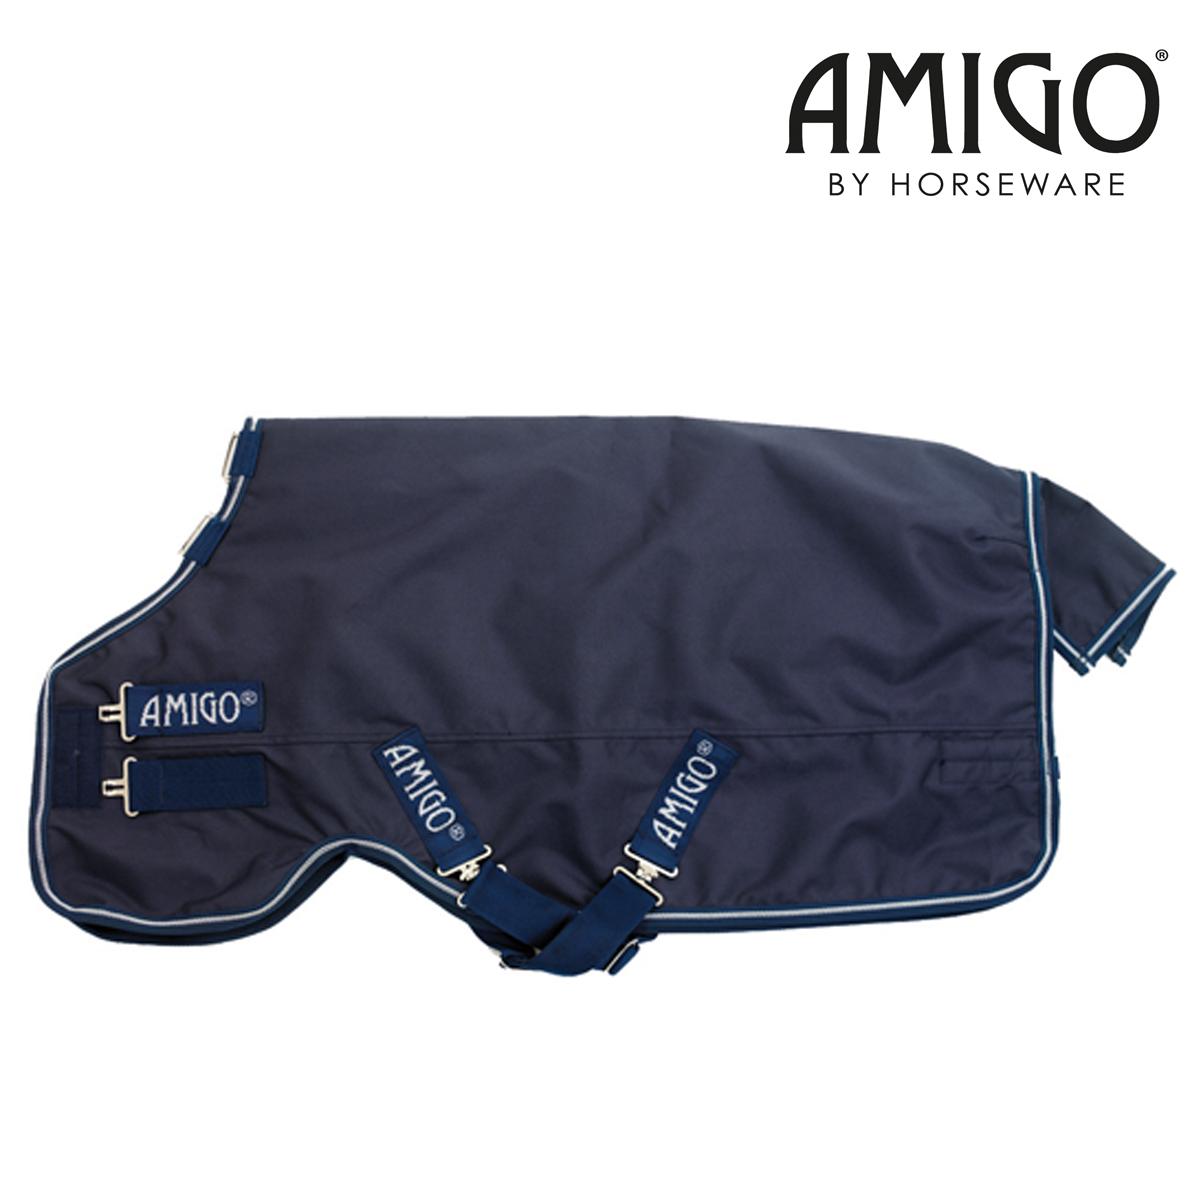 Horseware Amigo Bravo 12 Heavy Turnout Rug -  FREE UK SHIPPING